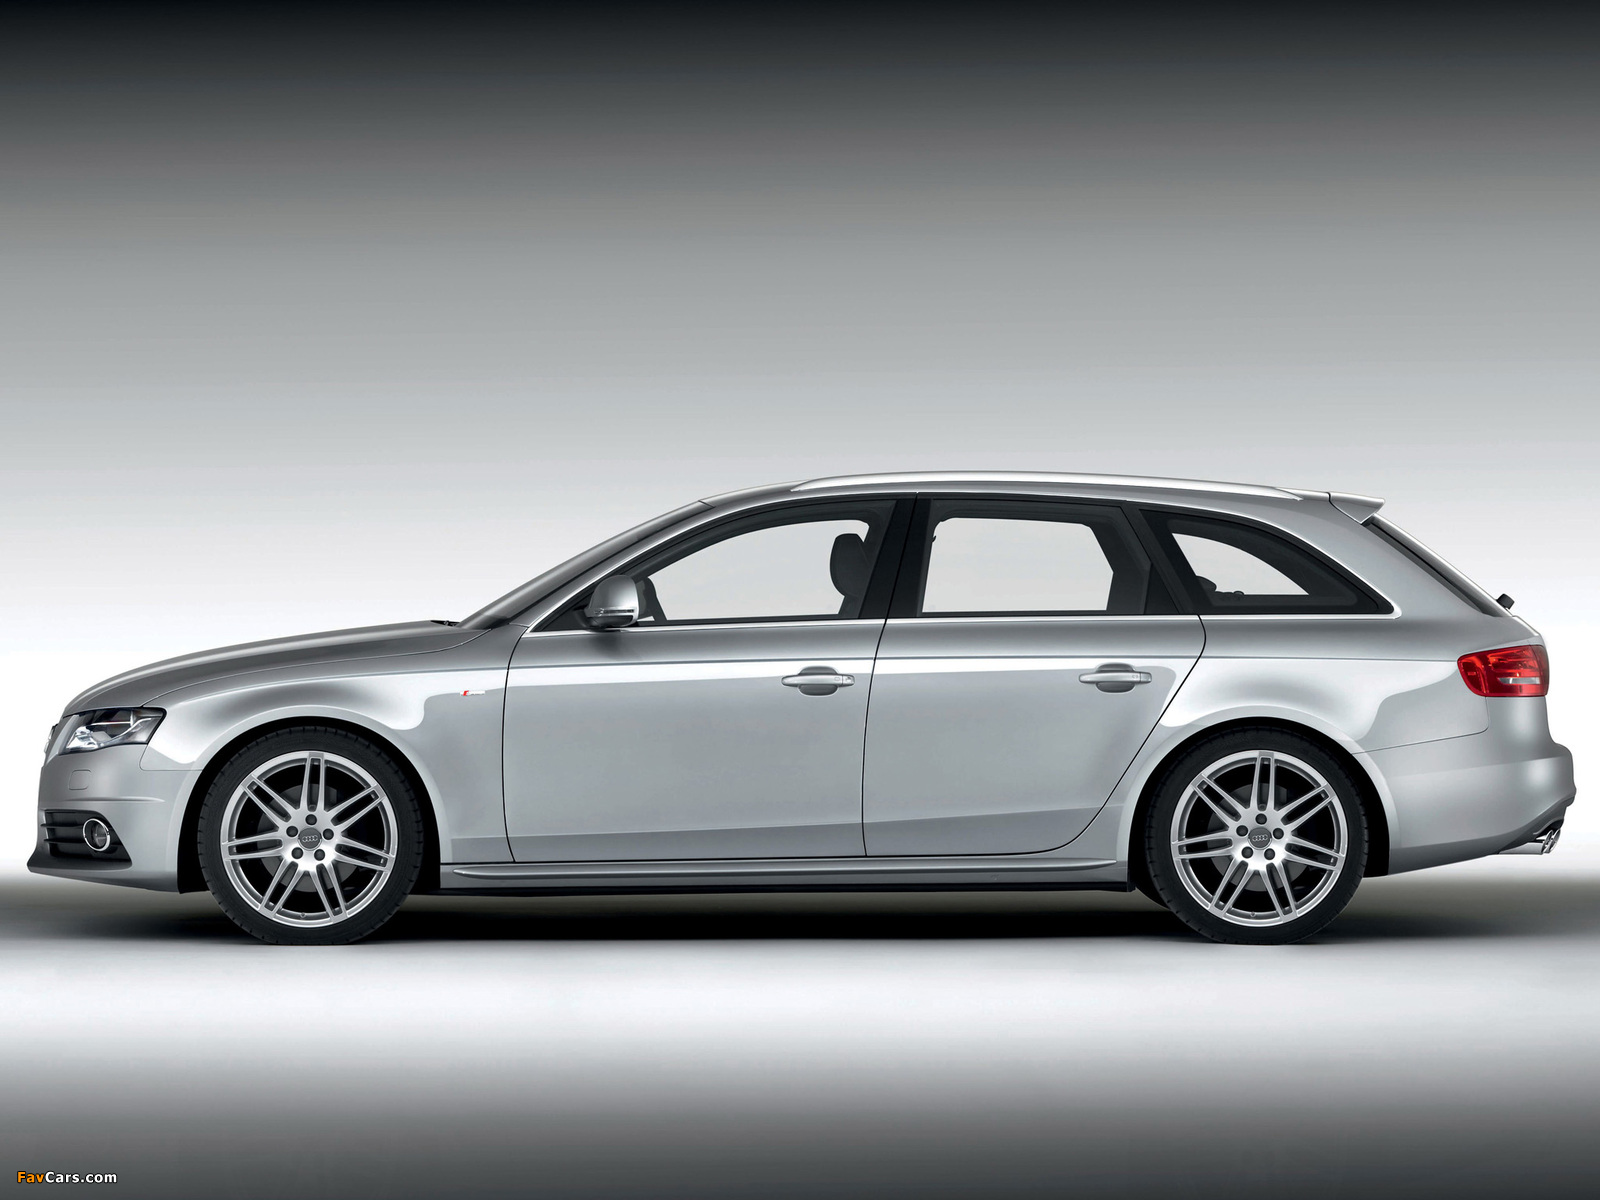 Photos Of Audi A4 1 8t S Line Avant B8 8k 2008 2011